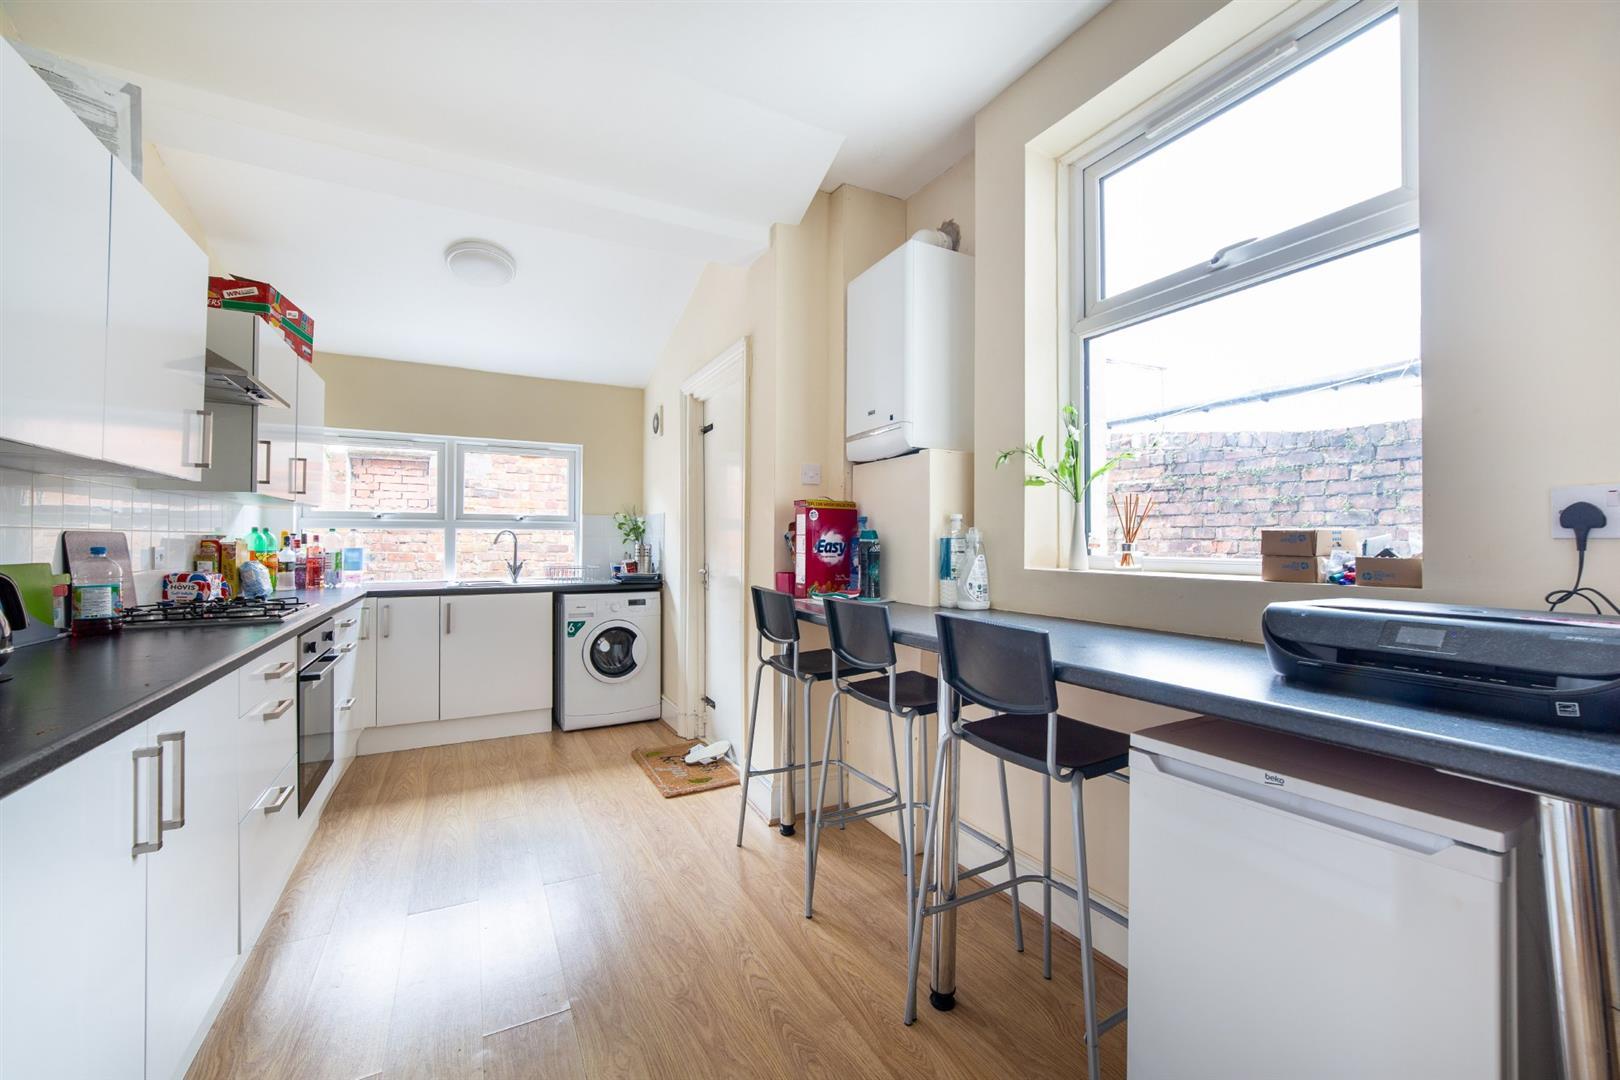 3 bed terraced house to rent in Heaton, NE6 5HS, NE6